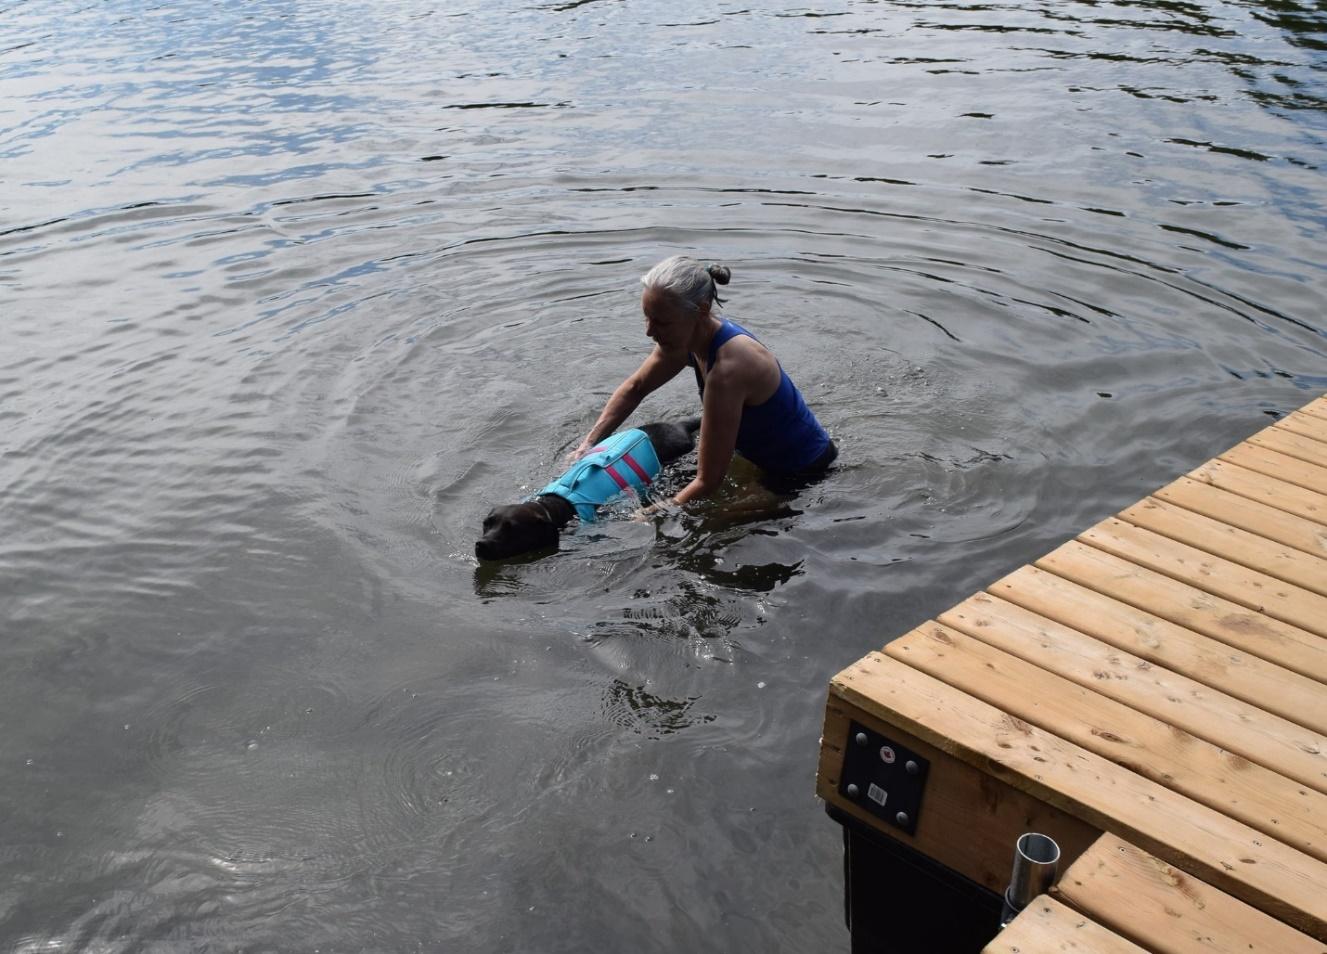 amputee dog swimming